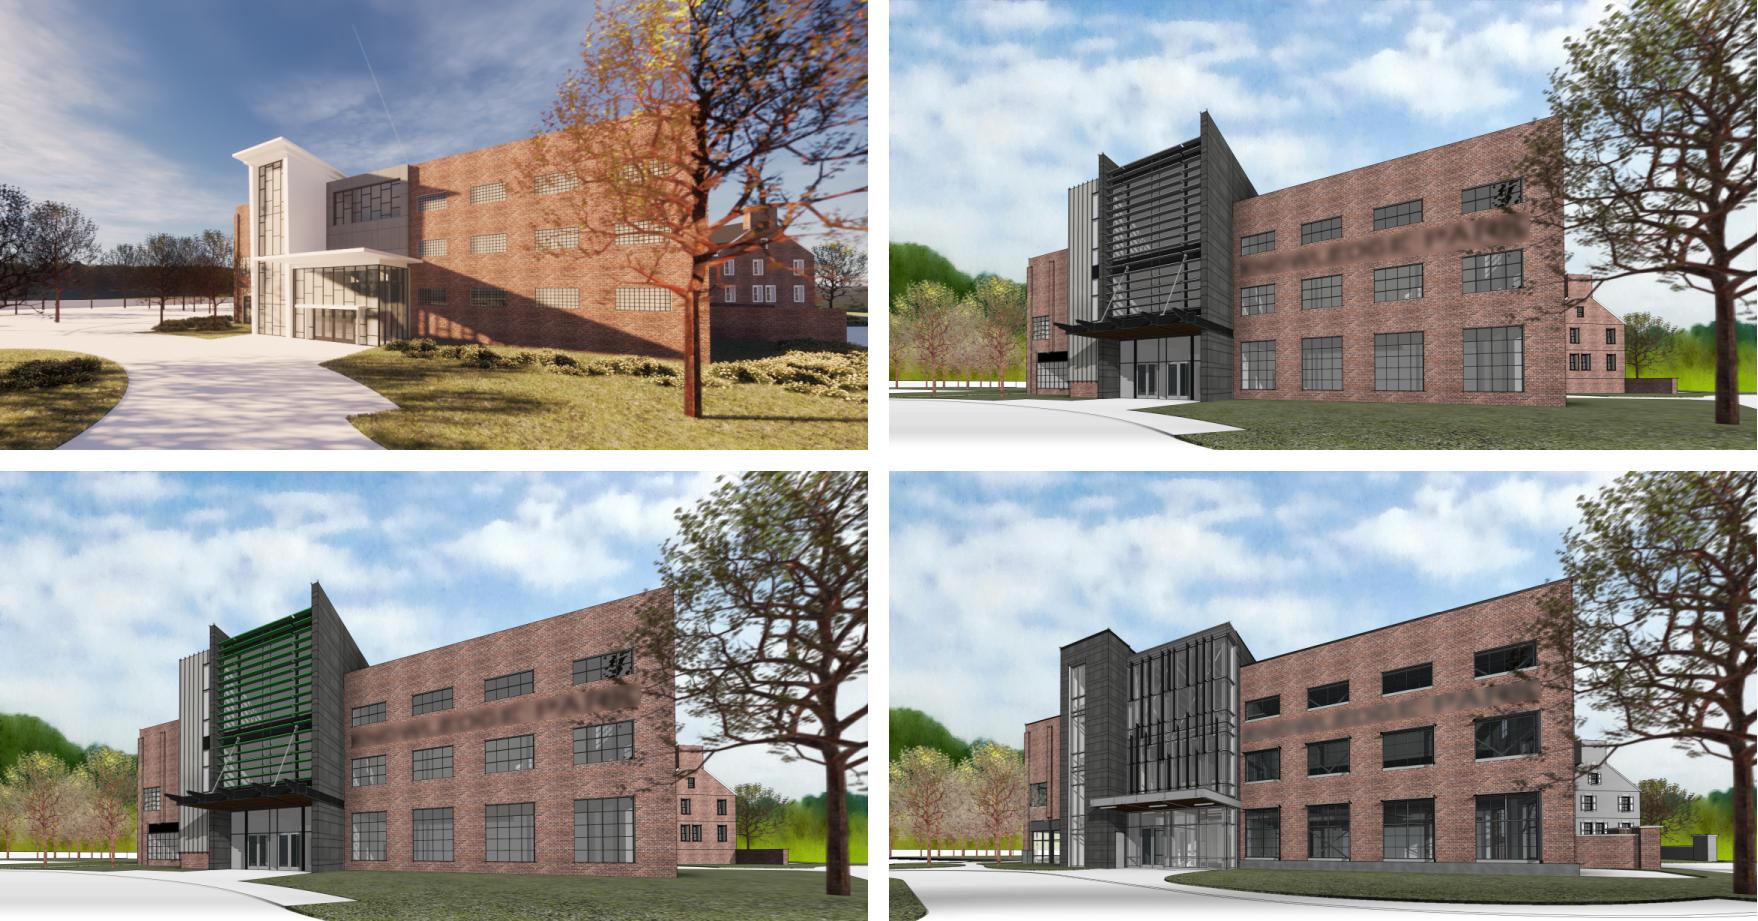 design rendering studies of campus building facade